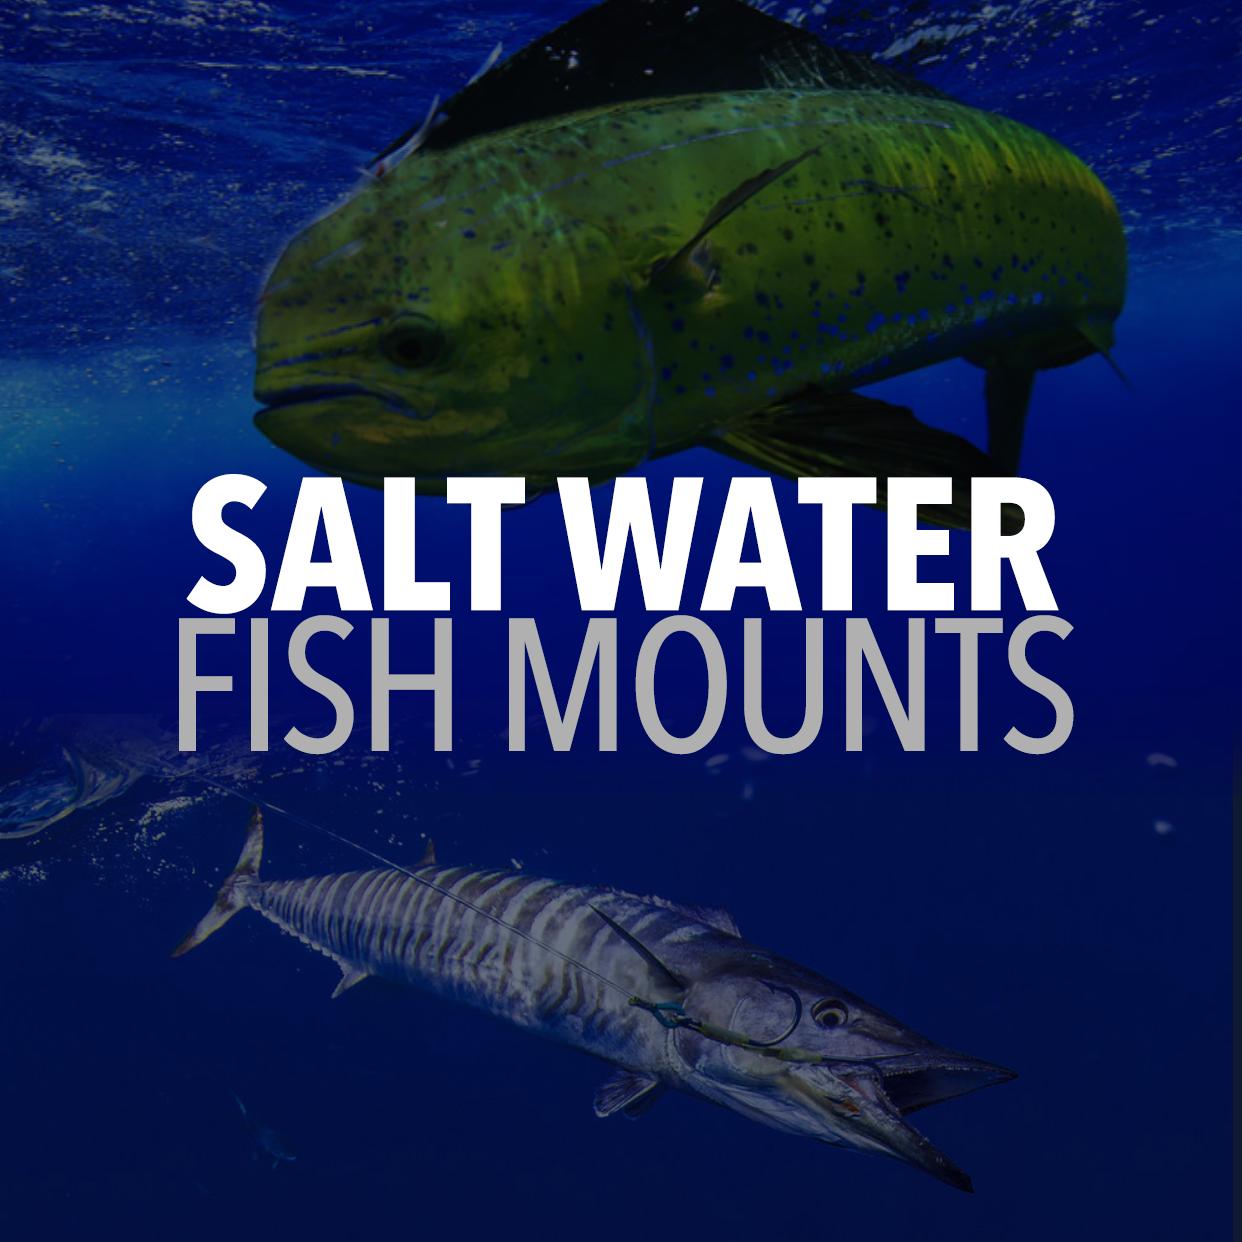 Saltwater fishmounts | Freshwater fishmounts | Mounted fish | Fish